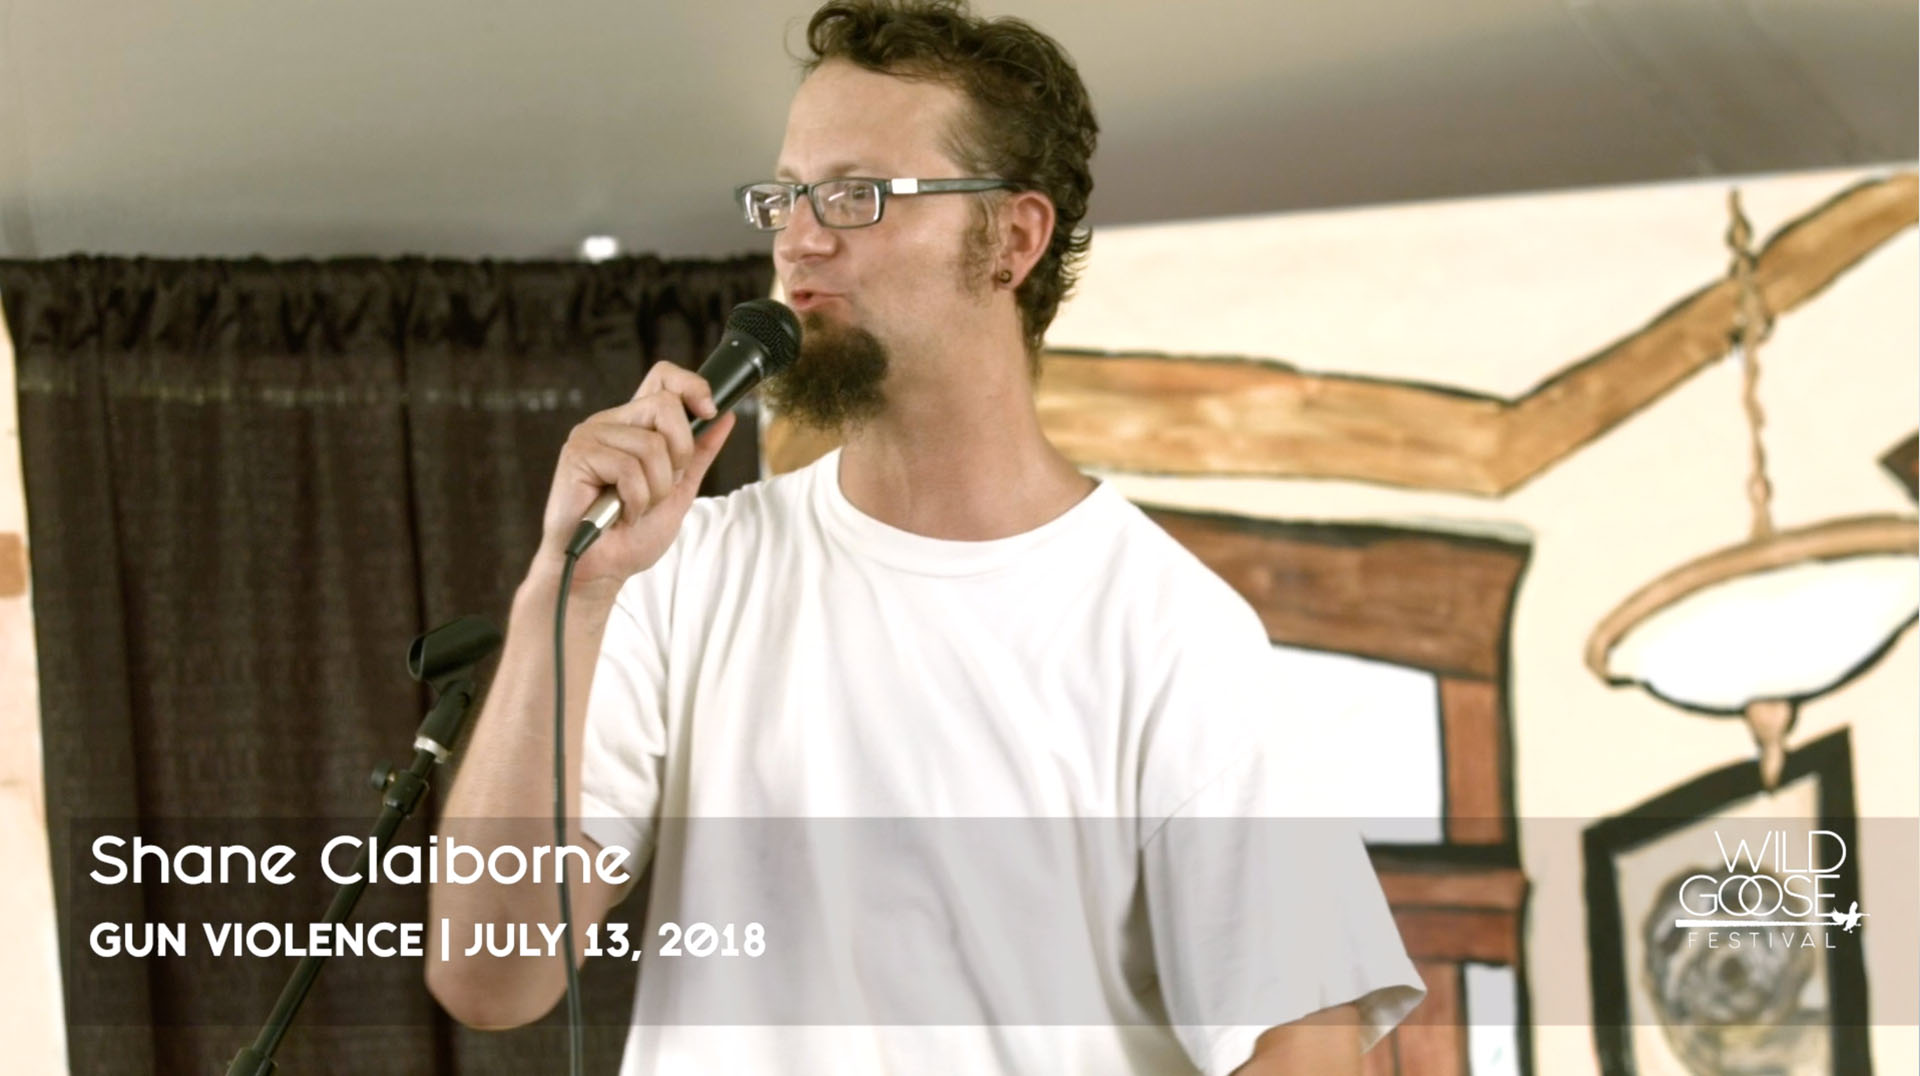 Shane Claiborne on Gun Violence